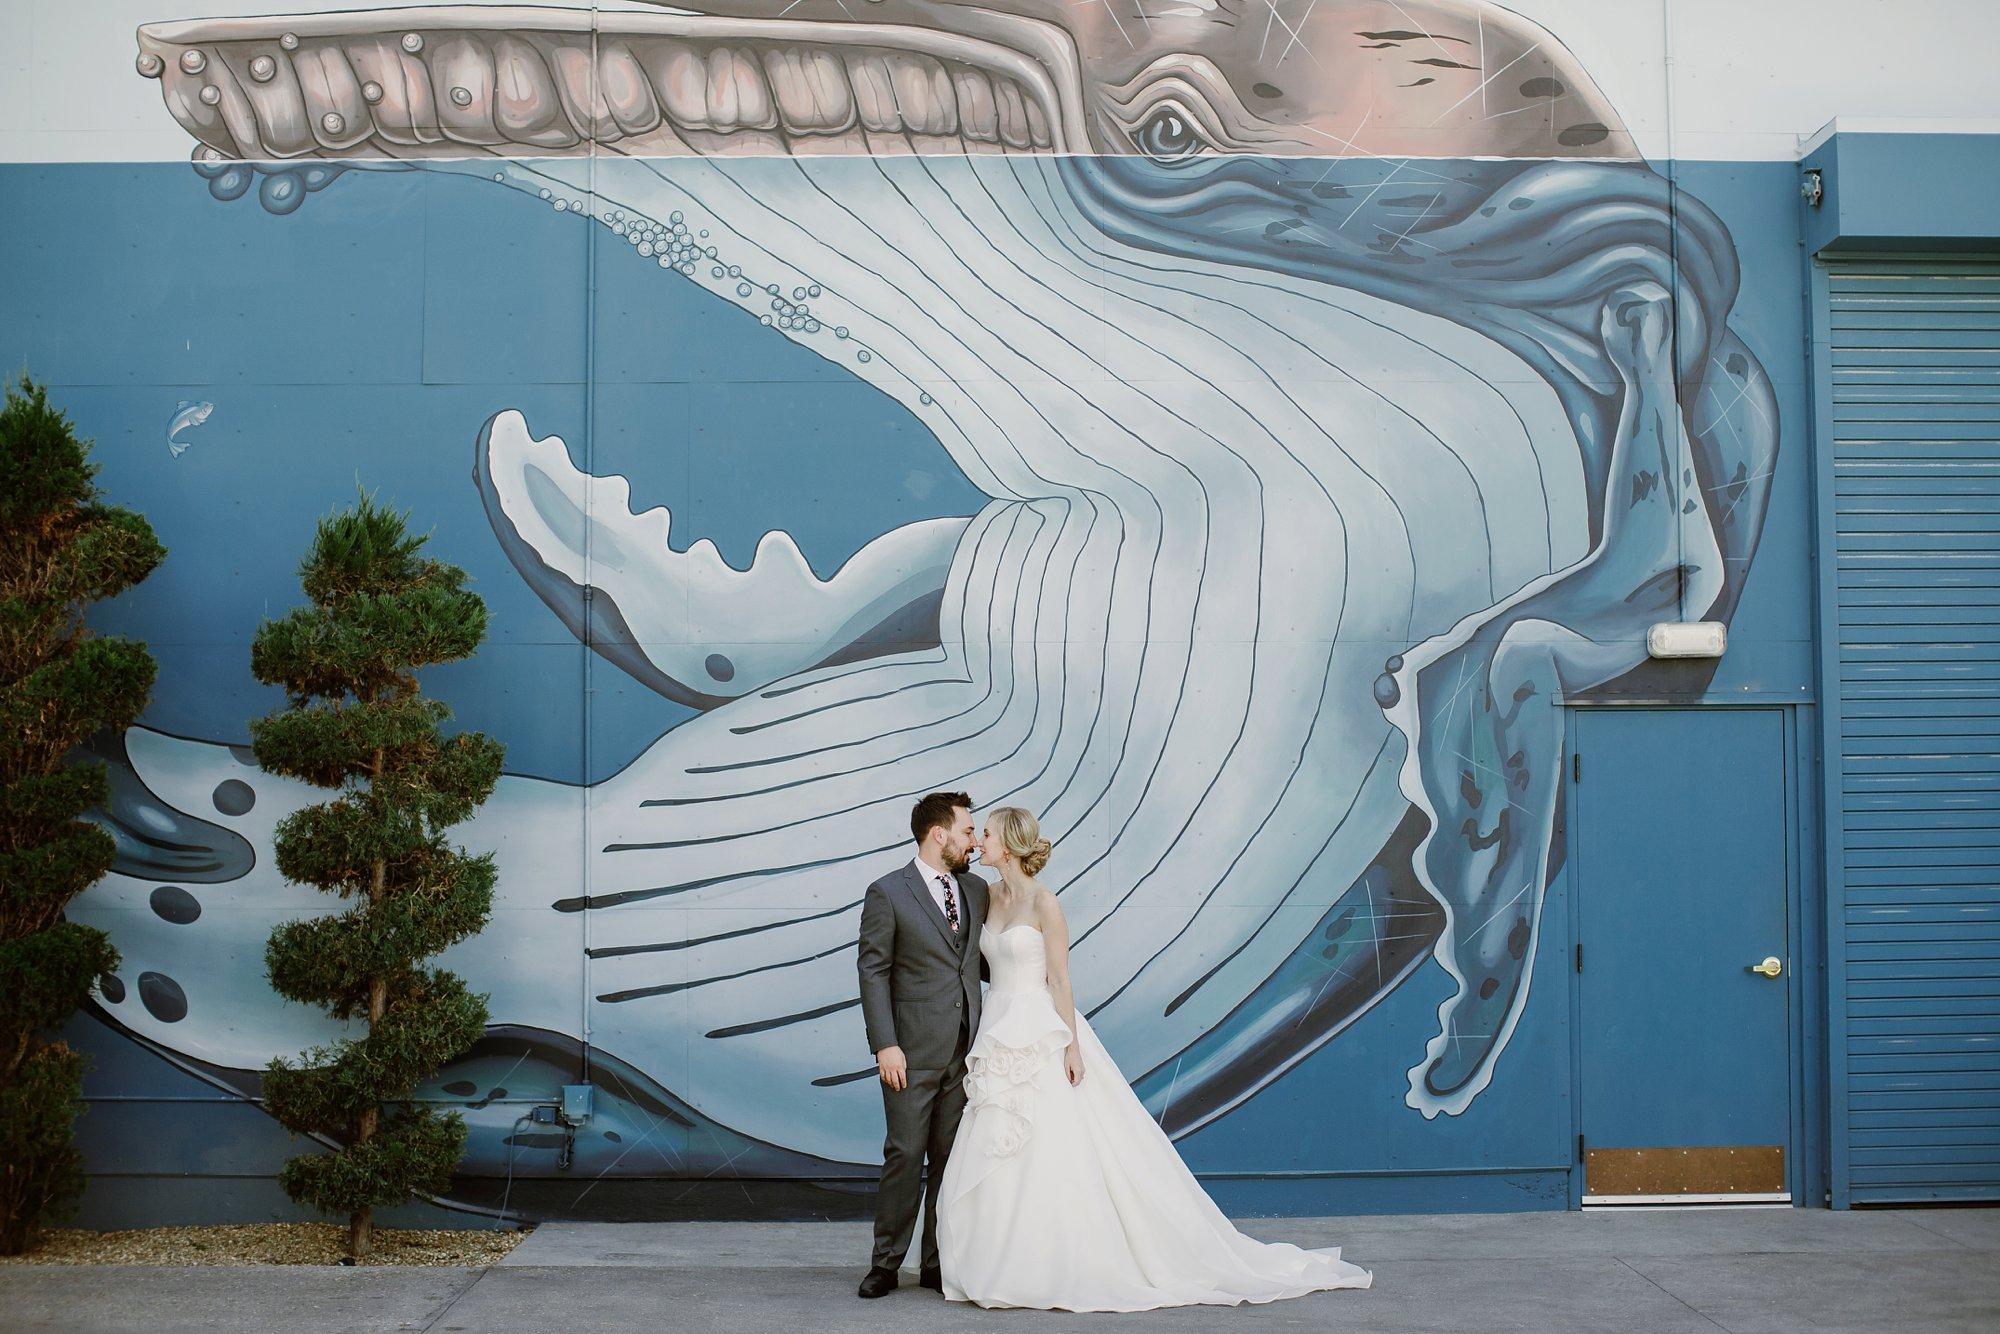 Best Wedding Dress Shops In Los Angeles Pemerintah Kota Ambon